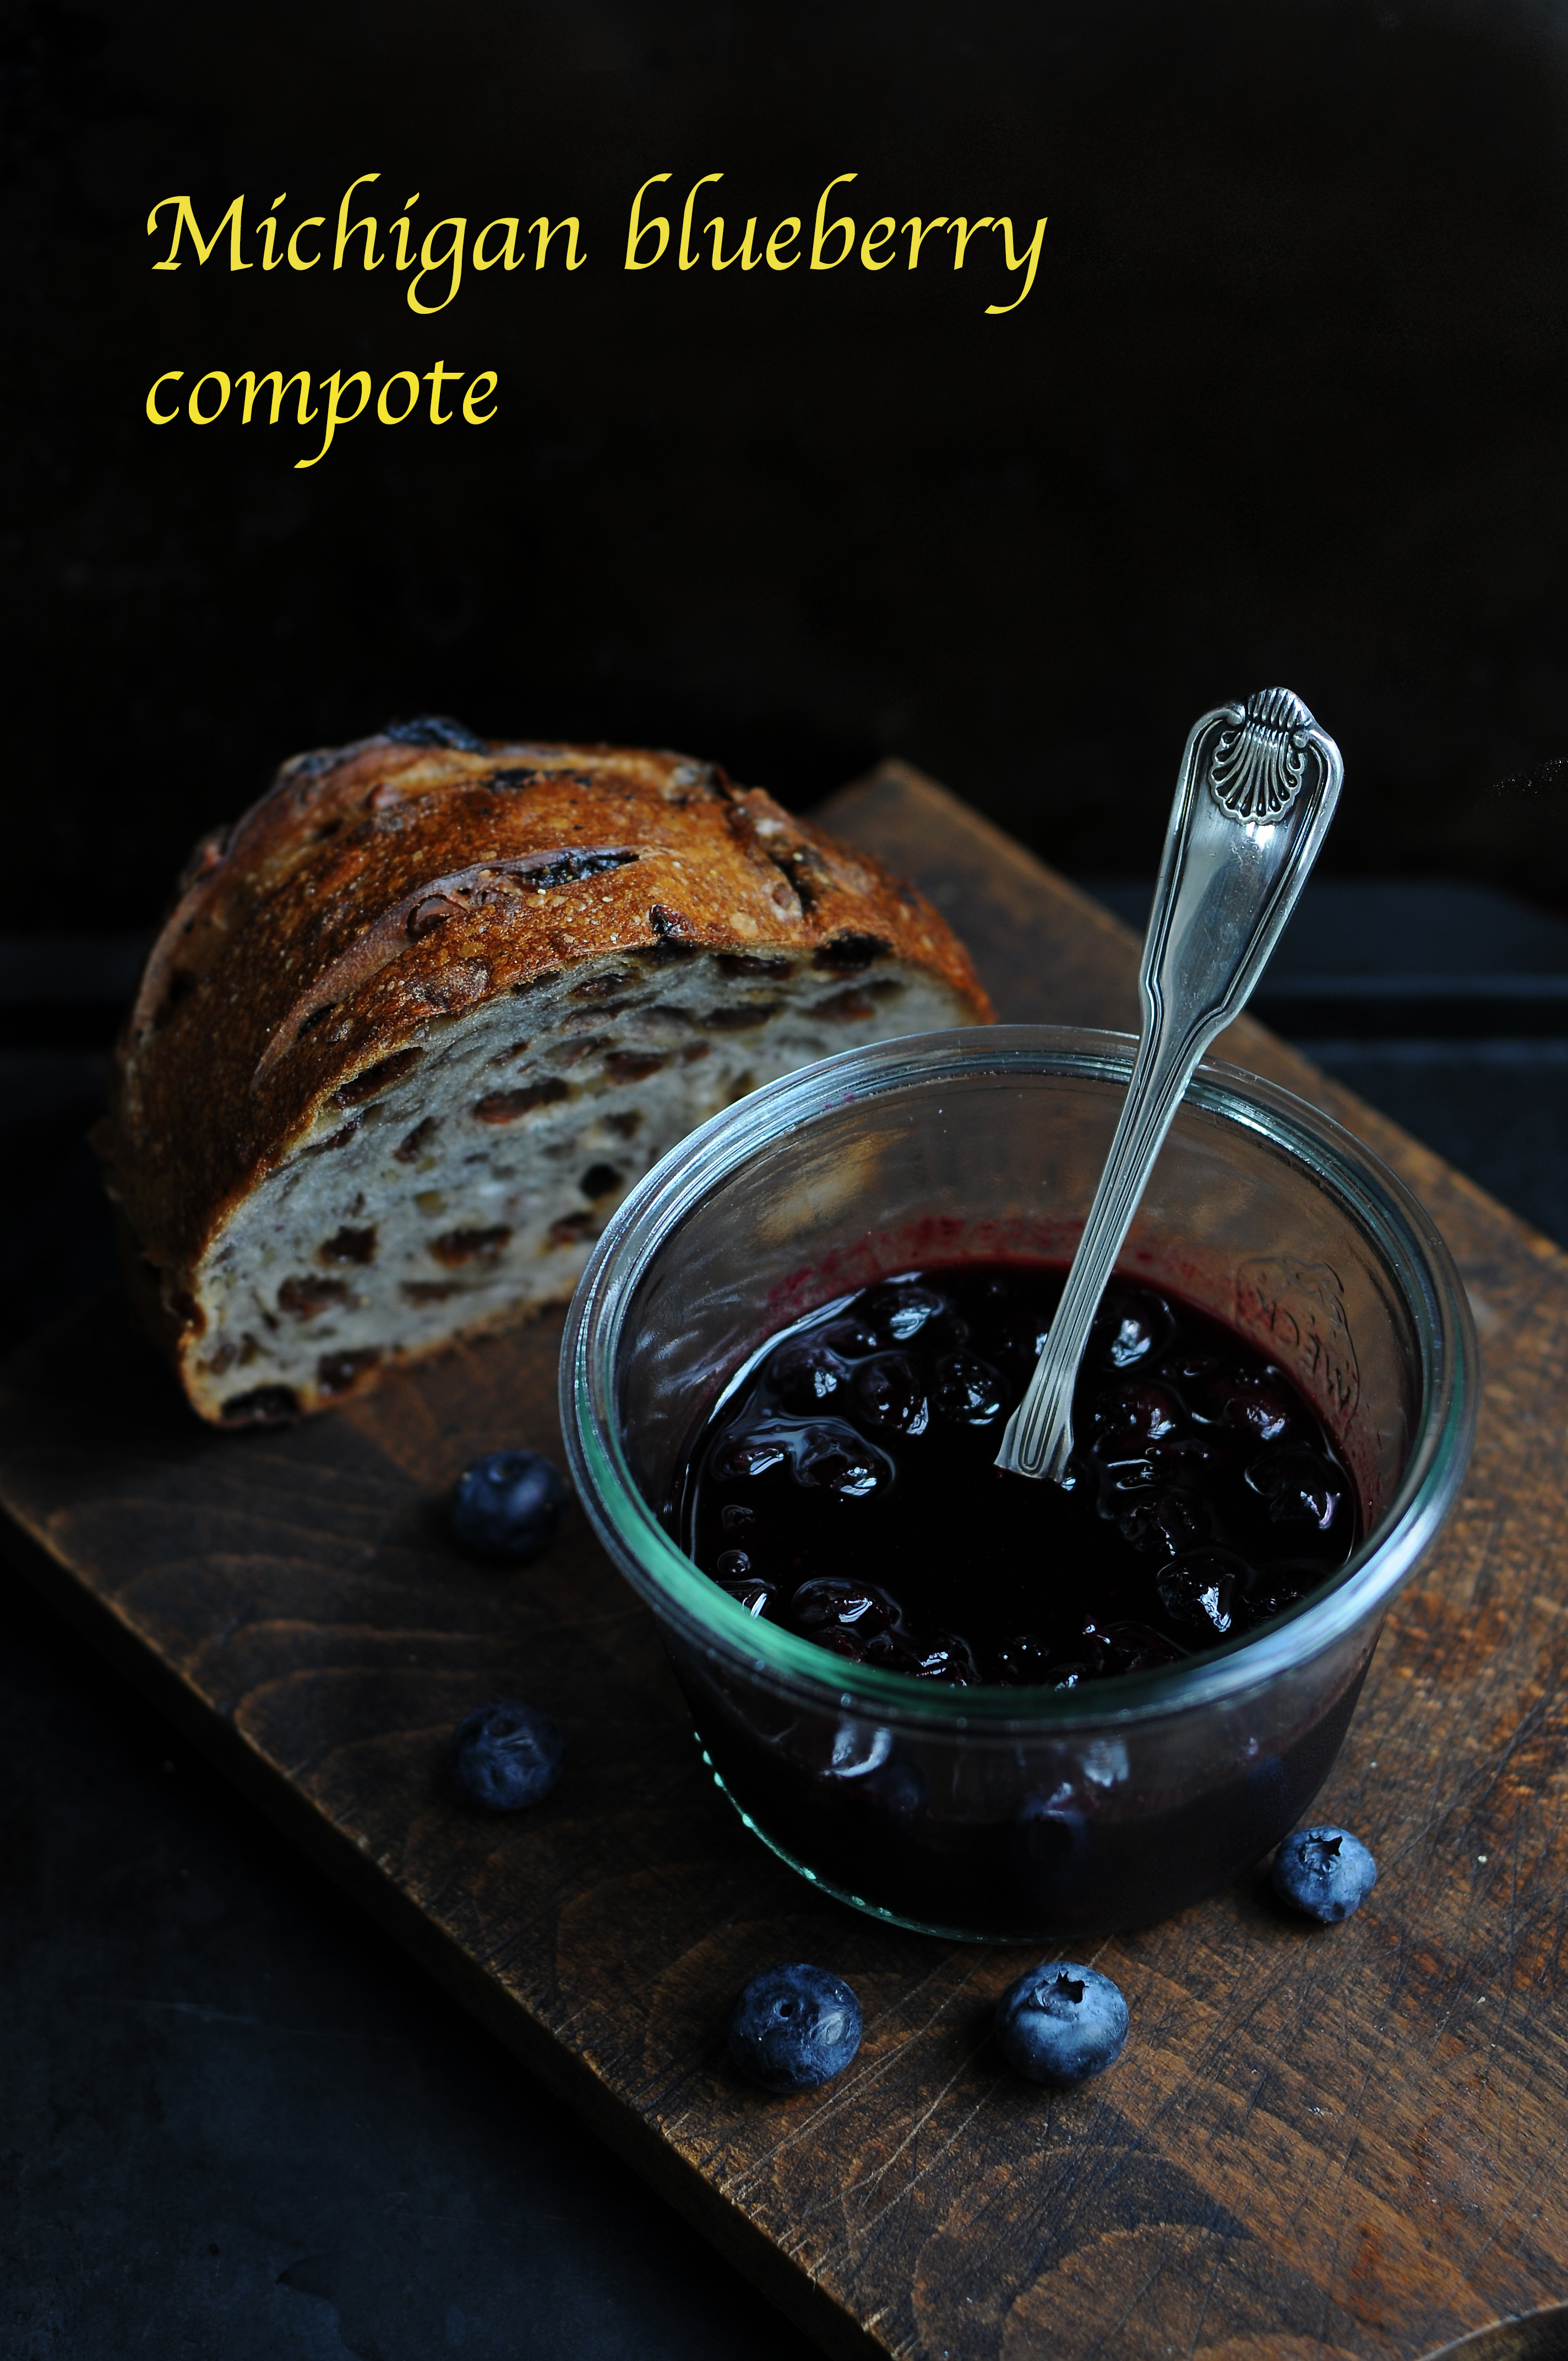 Michigan blueberry compote